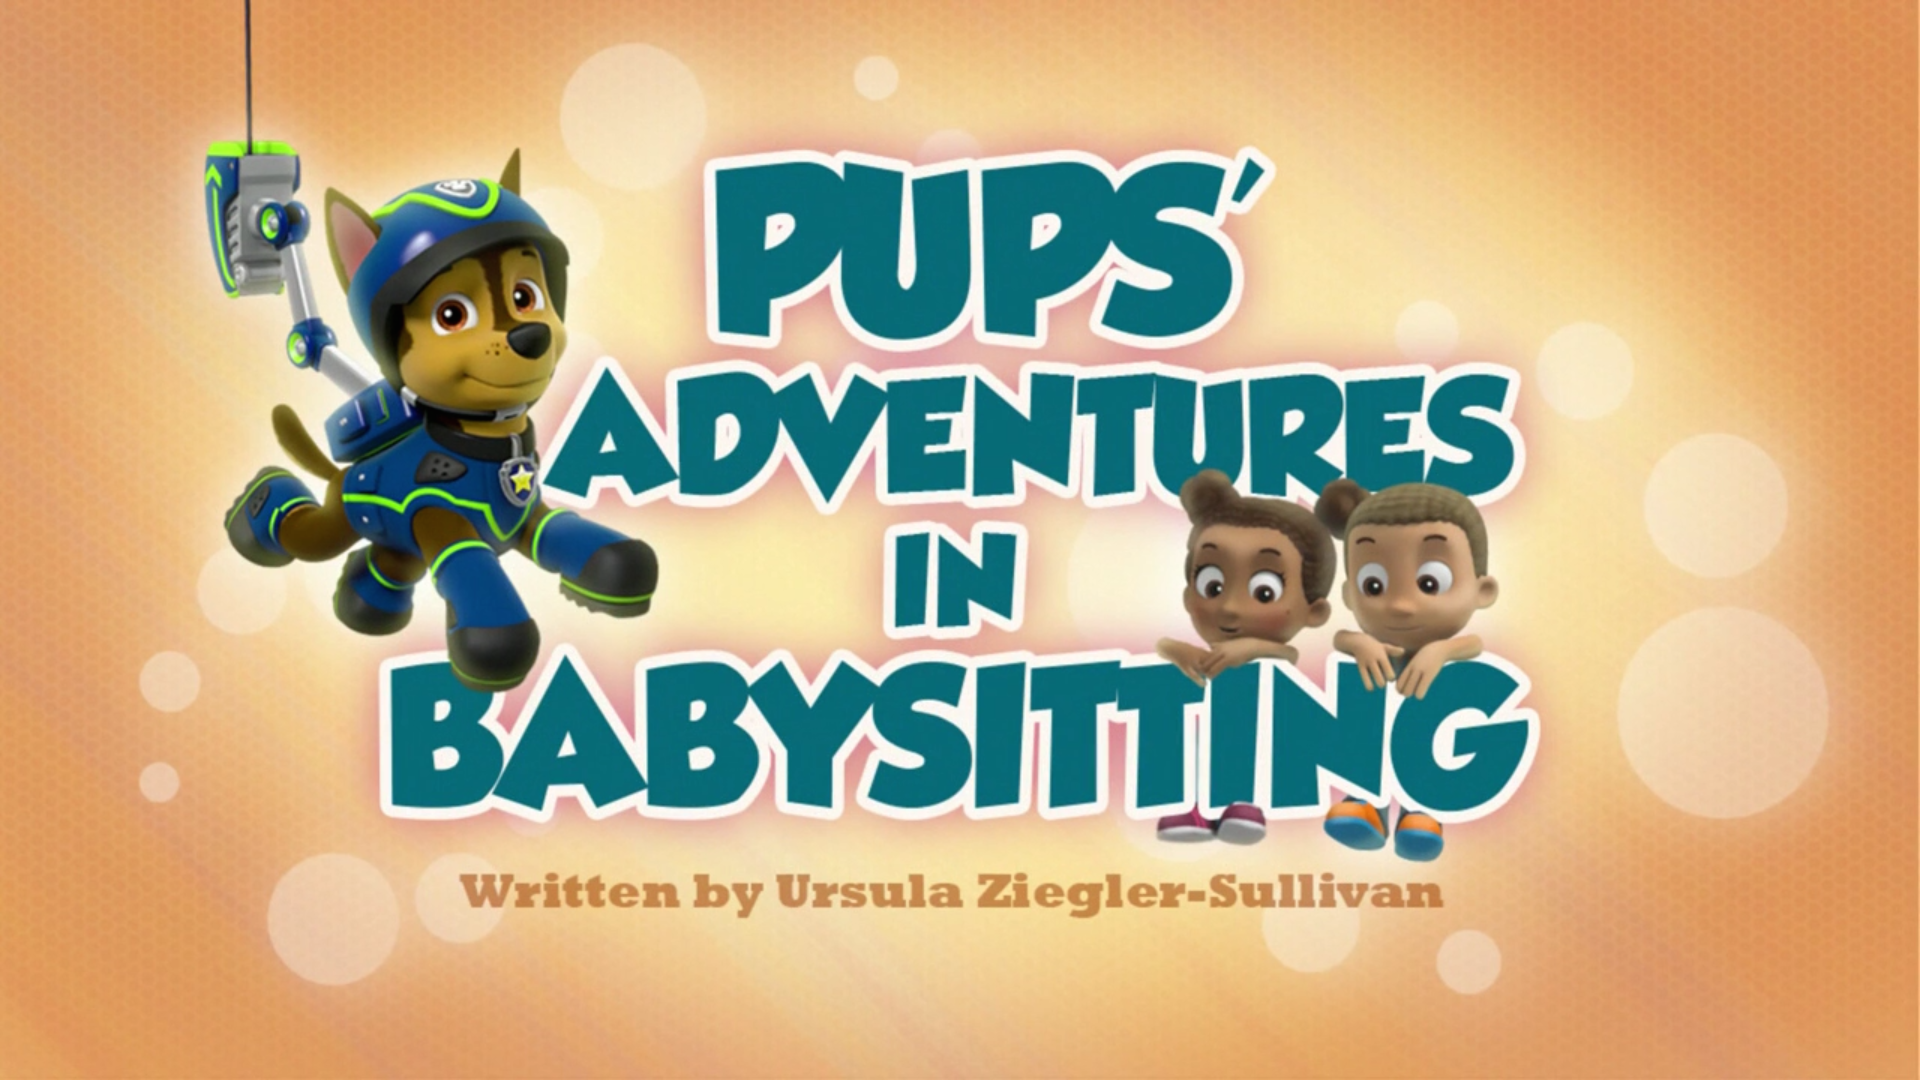 pups adventures in babysitting paw patrol wiki fandom powered pups adventures in babysitting paw patrol wiki fandom powered by wikia